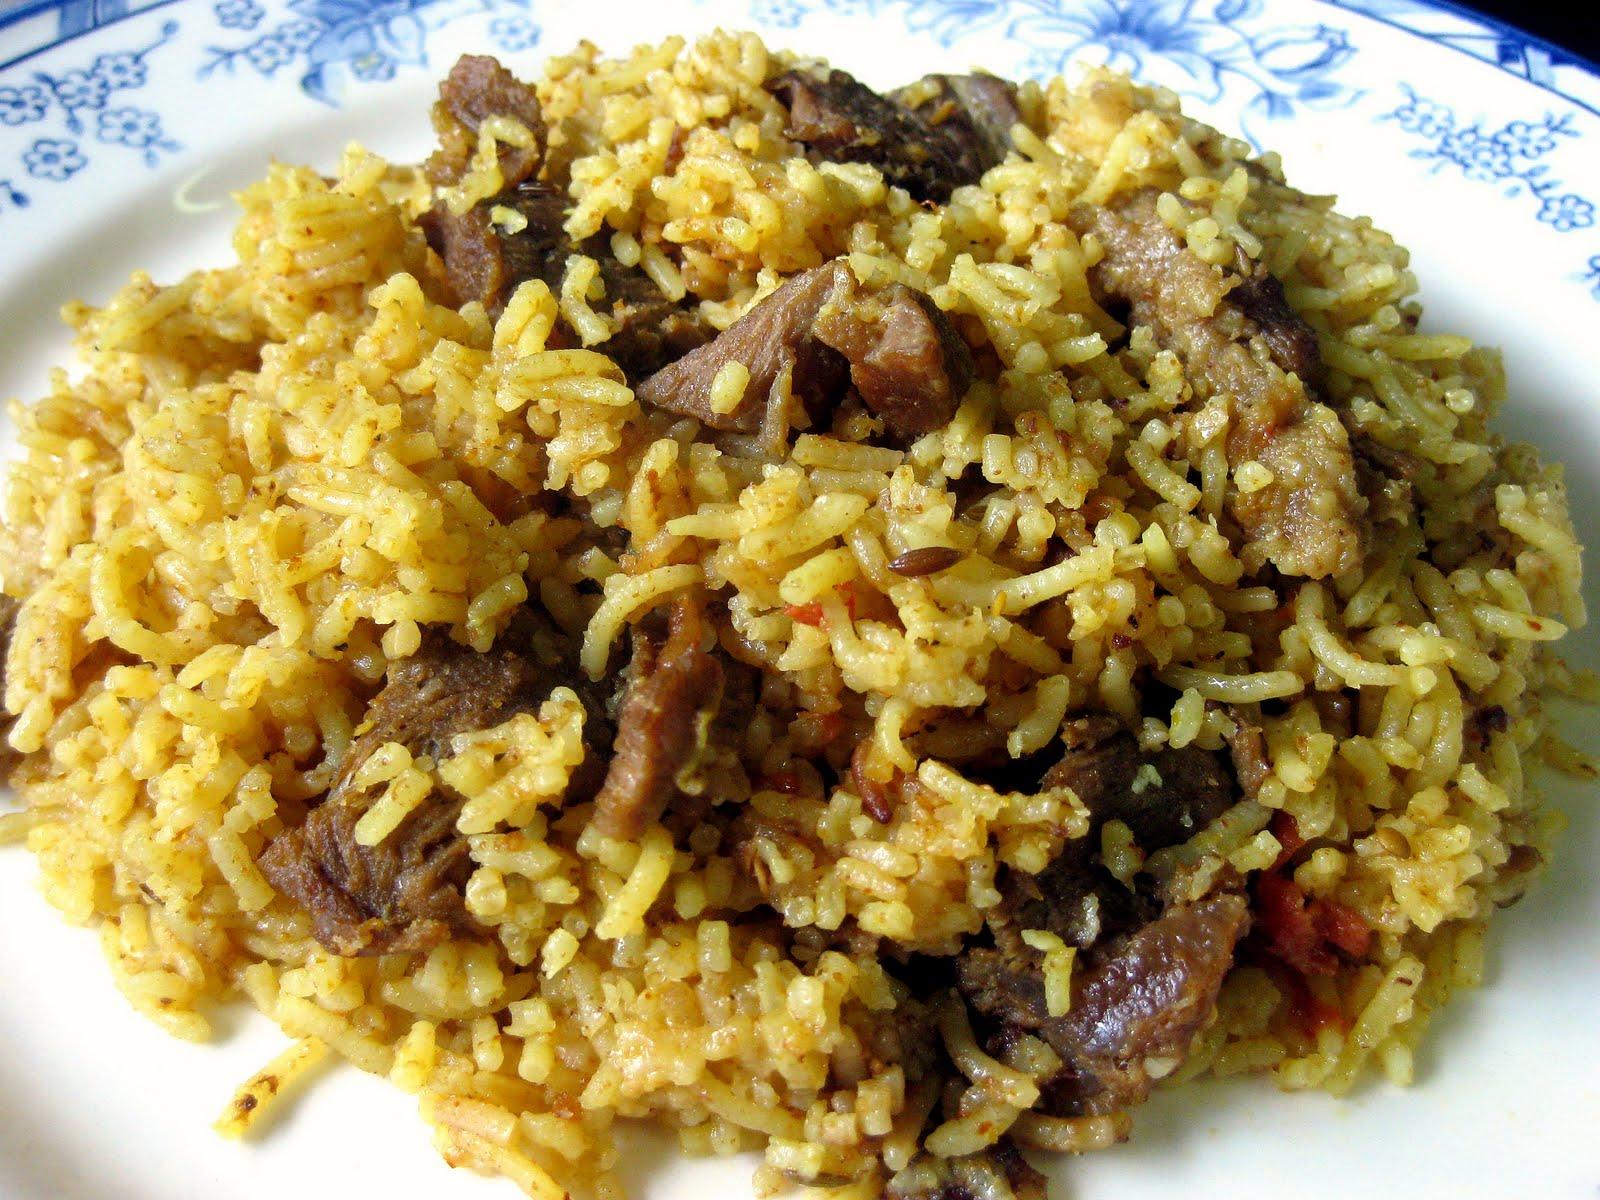 RESEPI NENNIE KHUZAIFAH: Nasi beriani daging Bombay